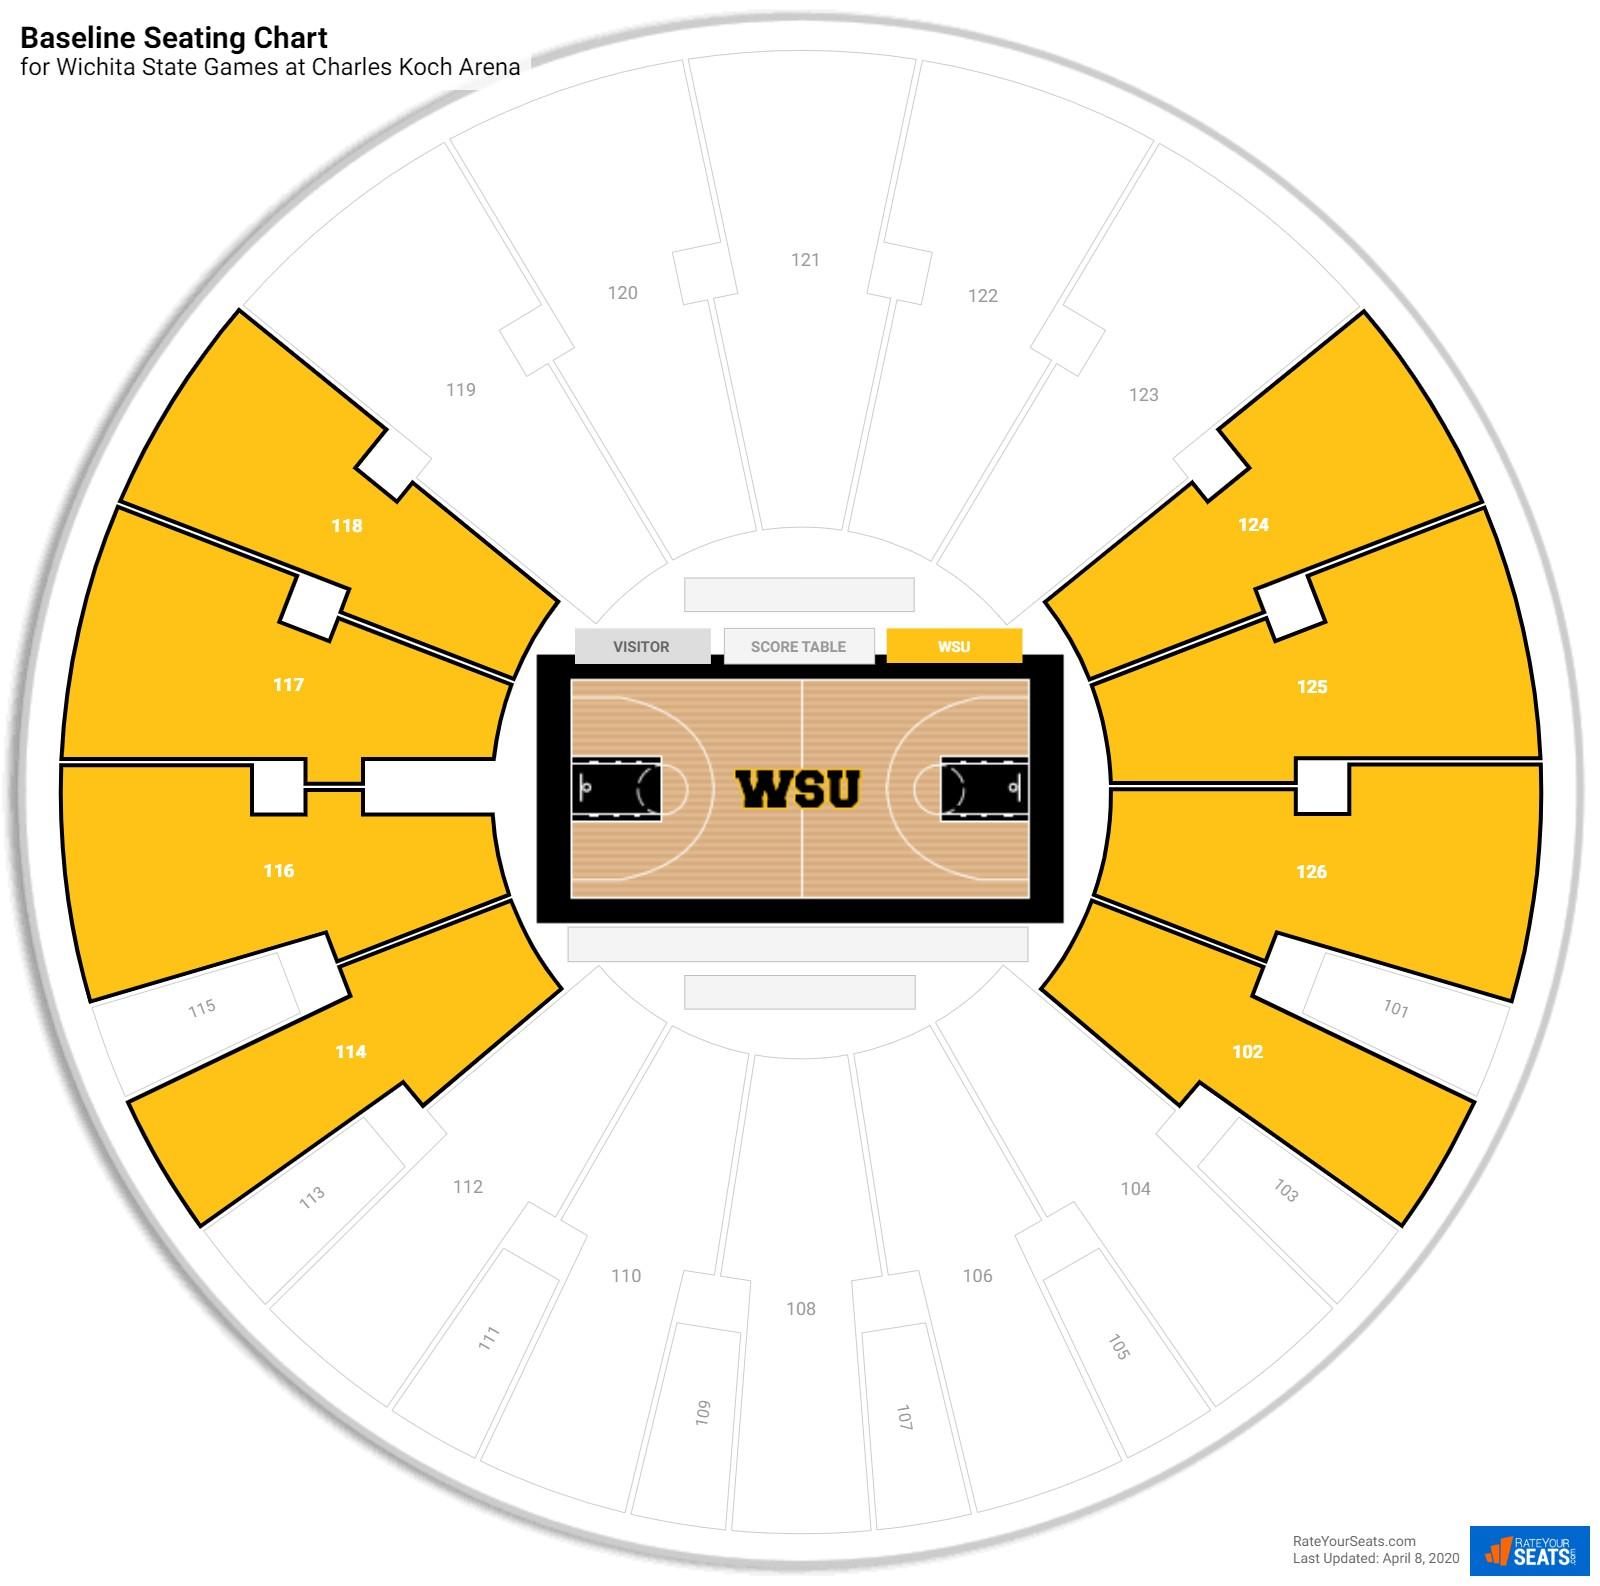 Charles Koch Arena Wichita State Seating Guide Rateyourseatscom